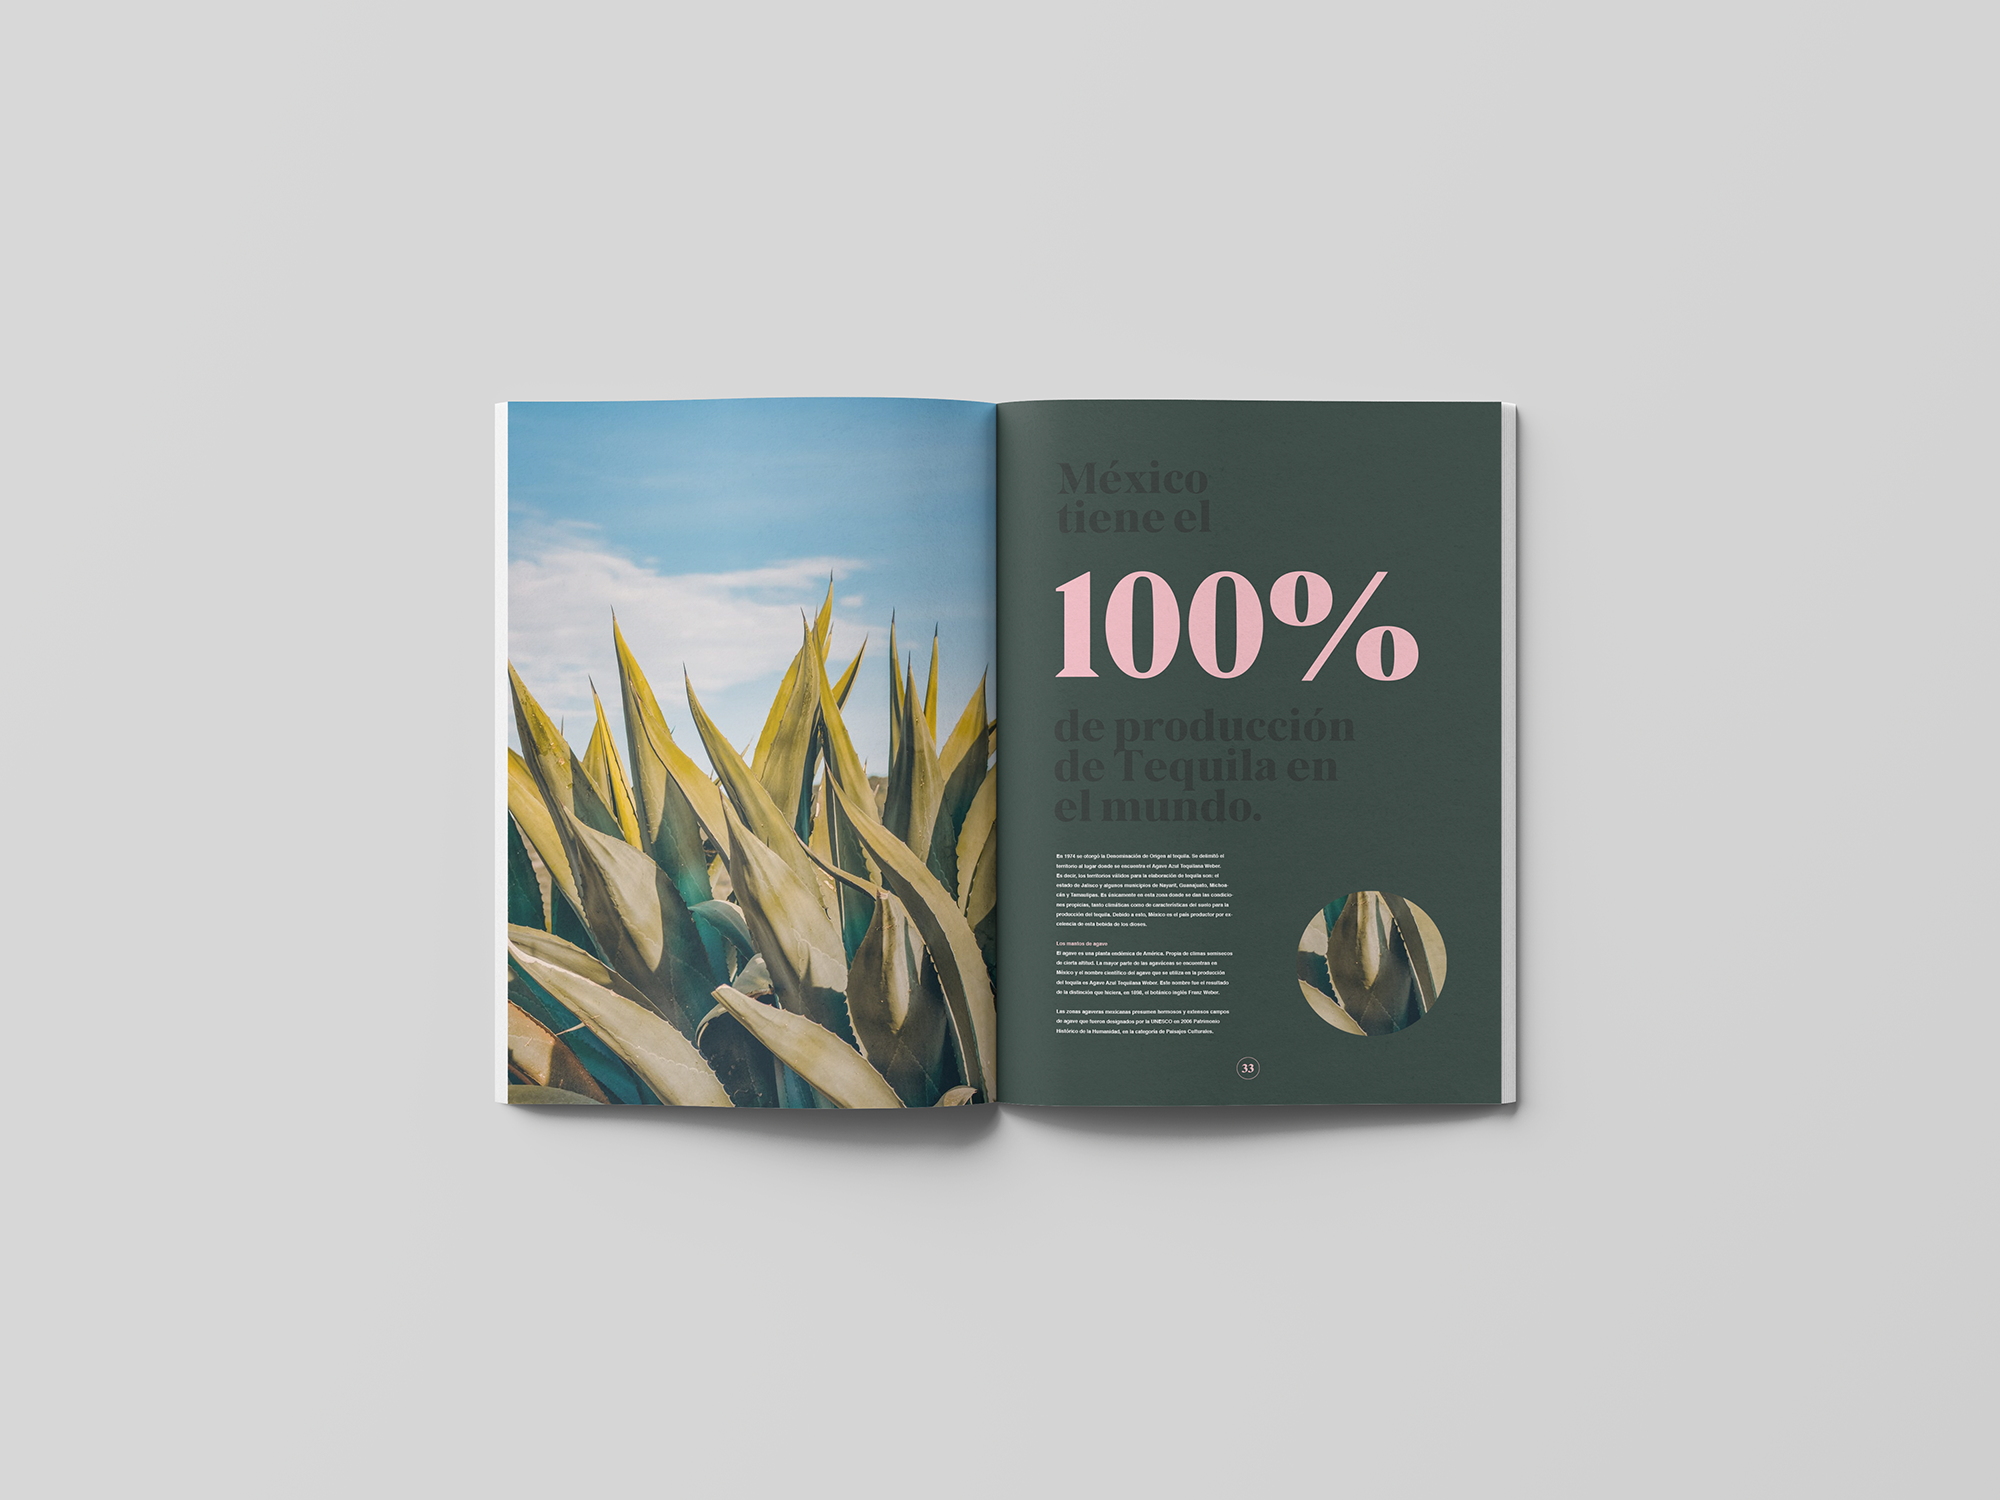 spread-10-book-agave-yoenpaperland